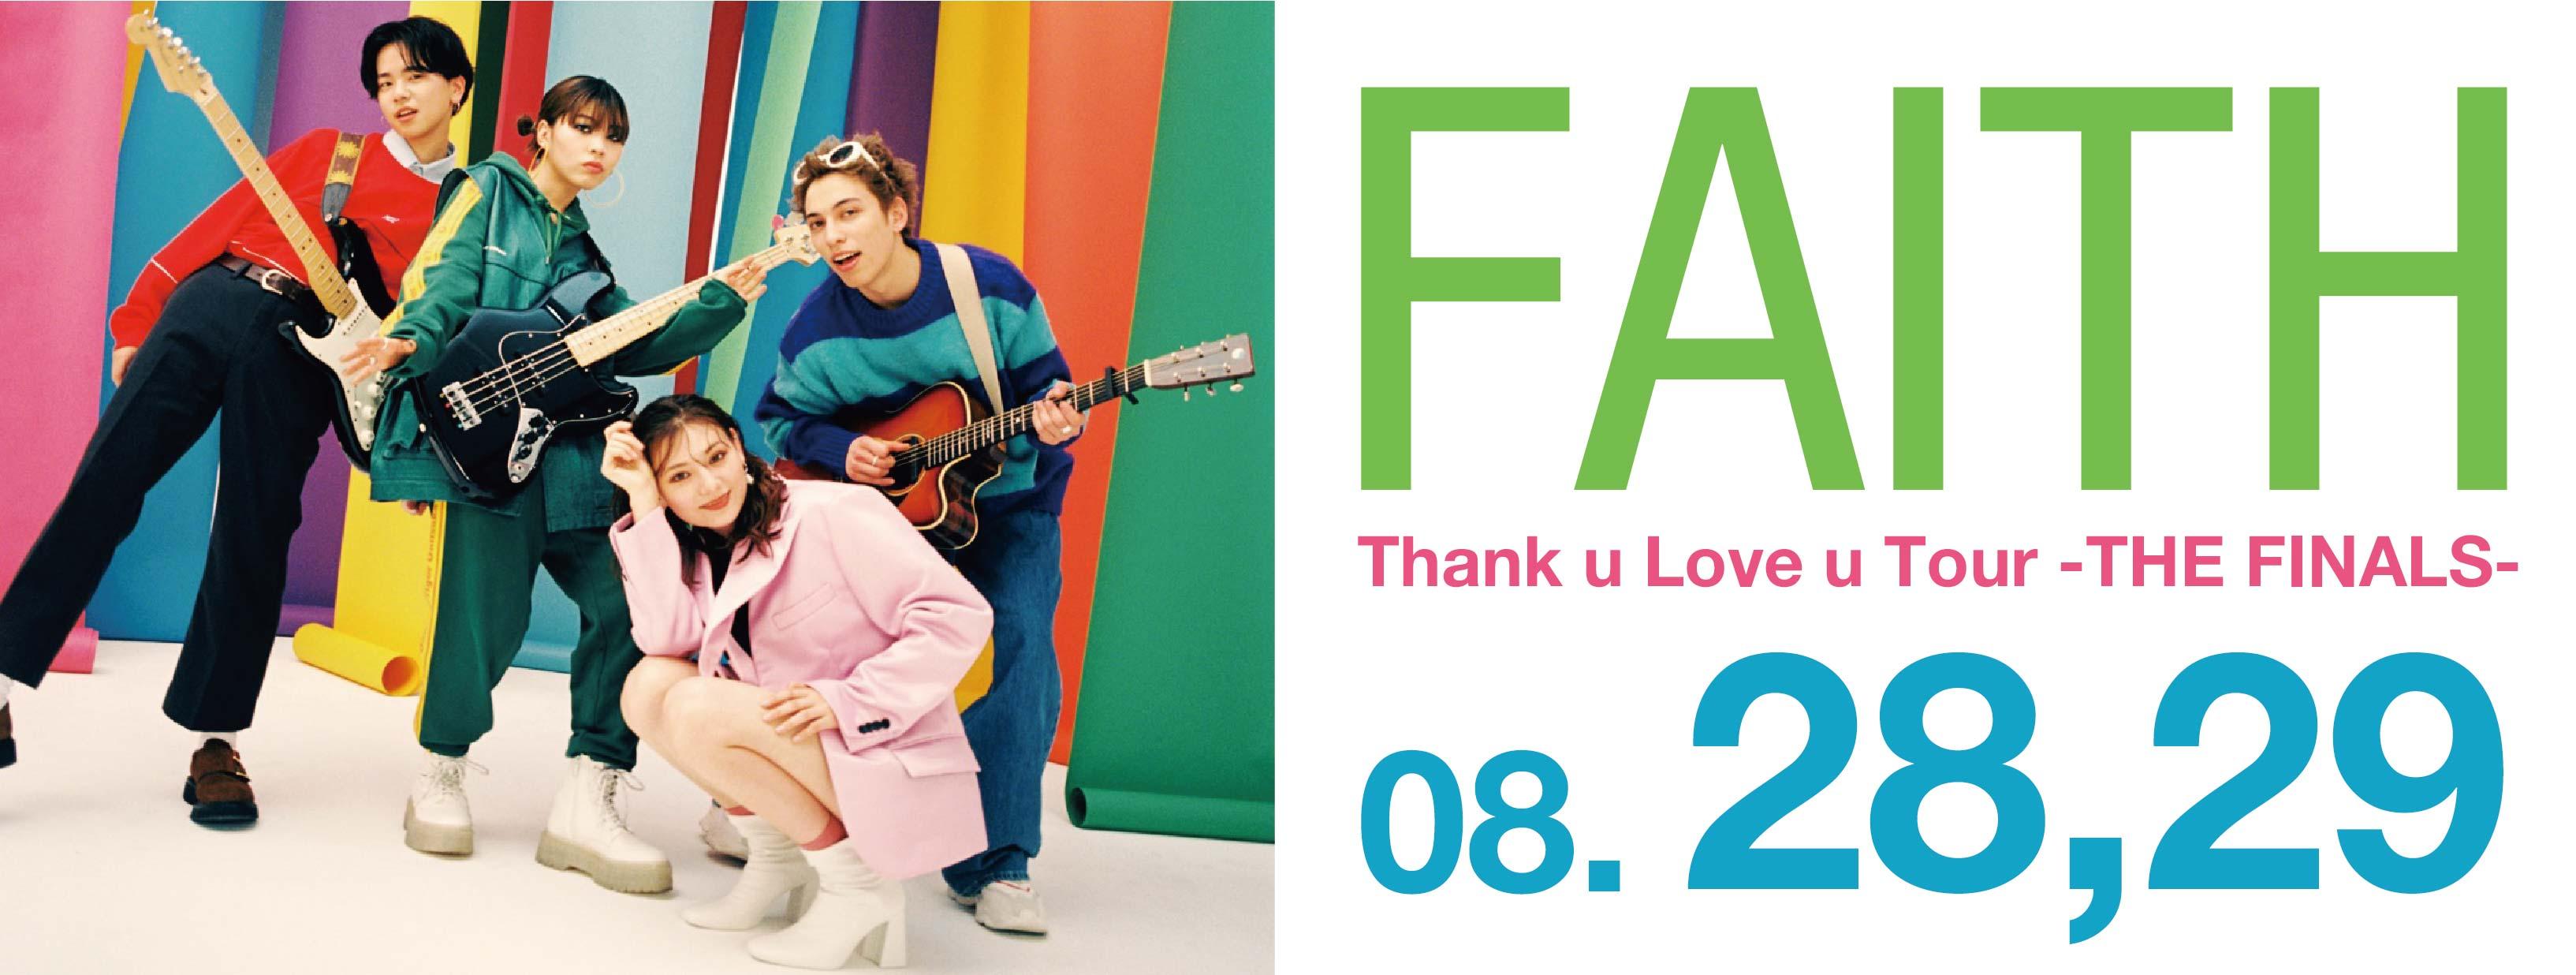 "FAITH presents ""Thank u Love u Tour -THE FINALS-"